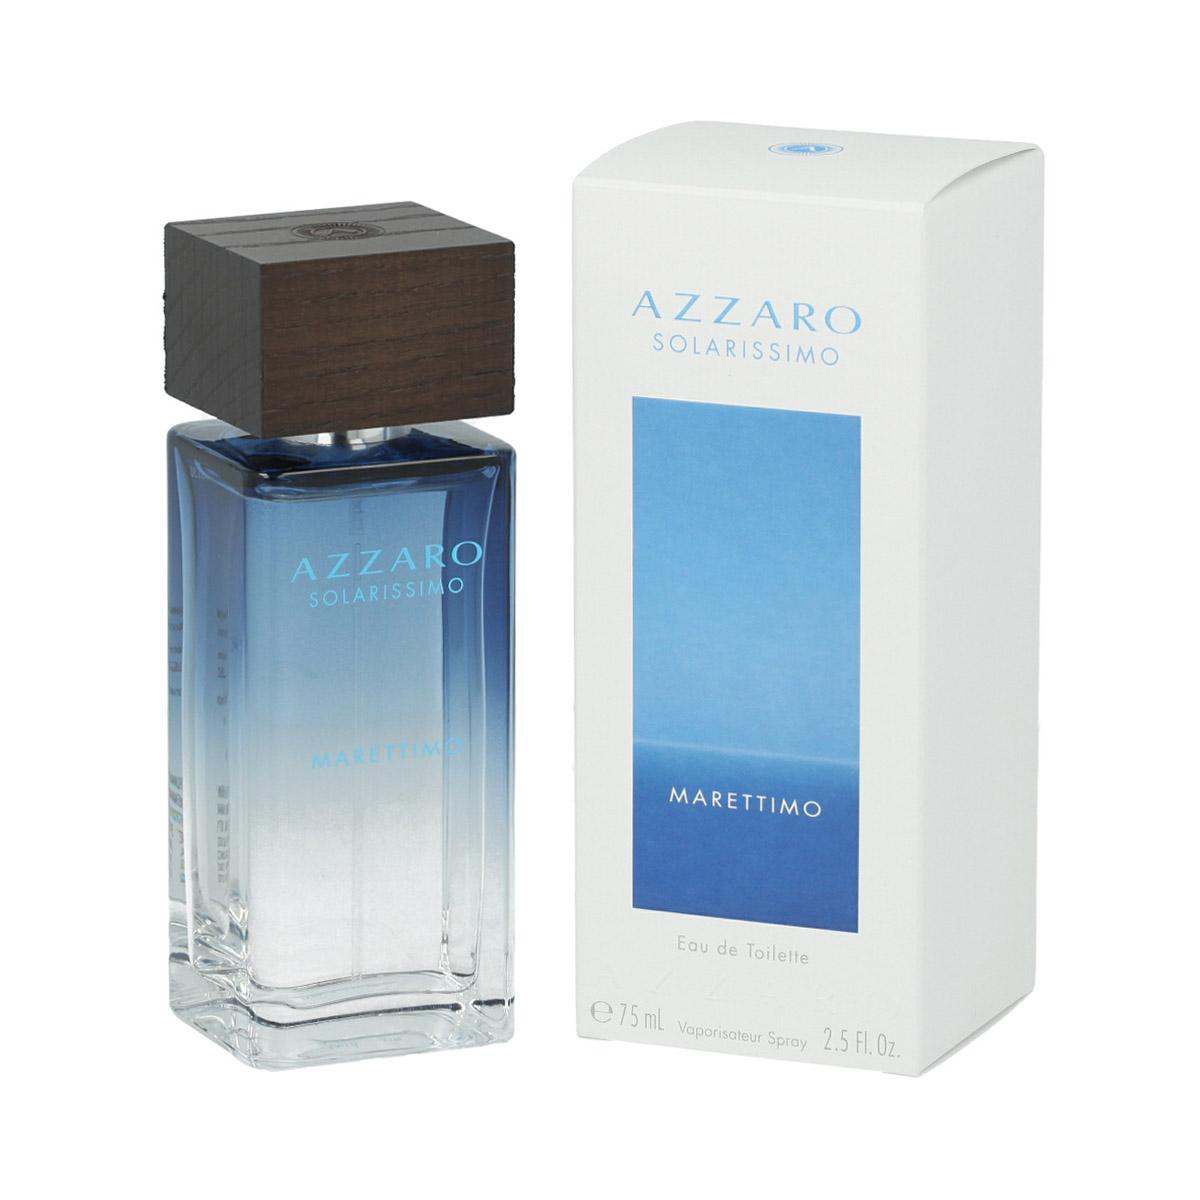 Azzaro Solarissimo Marettimo Eau De Toilette 75 ml (man) 16089